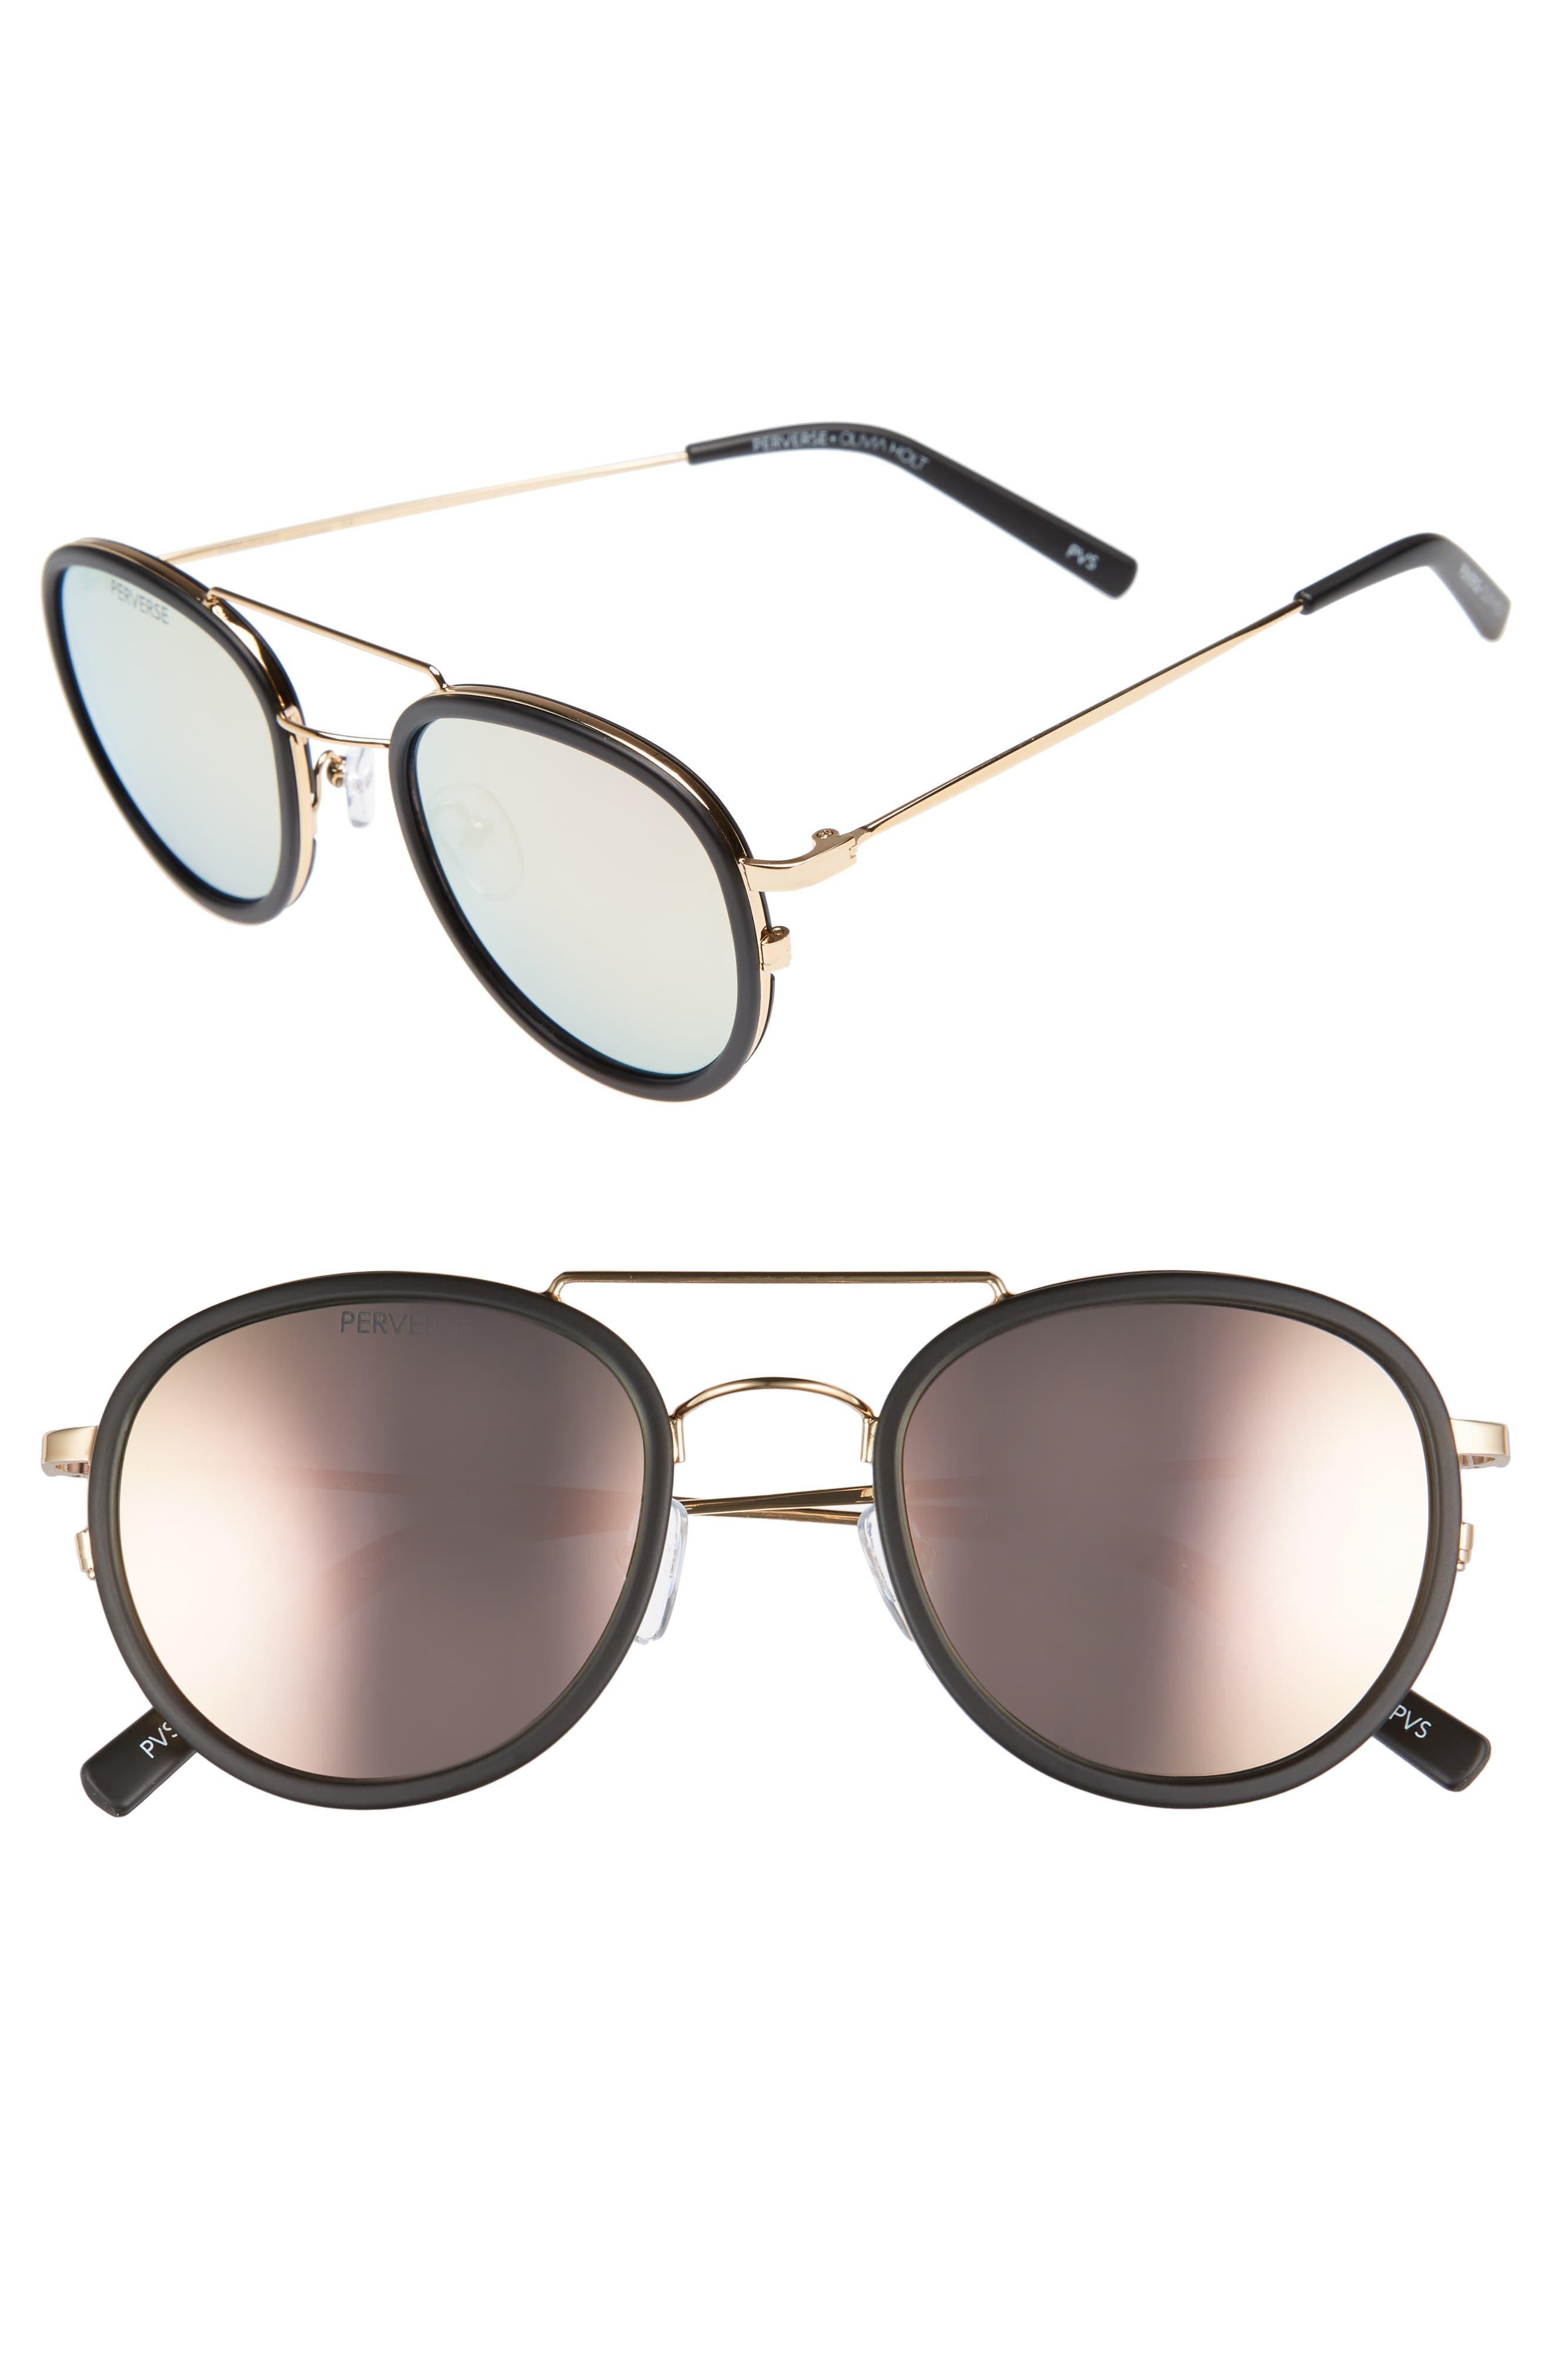 PERVERSE The Kimberly 55mm Mirrored Lens Aviator Sunglasses